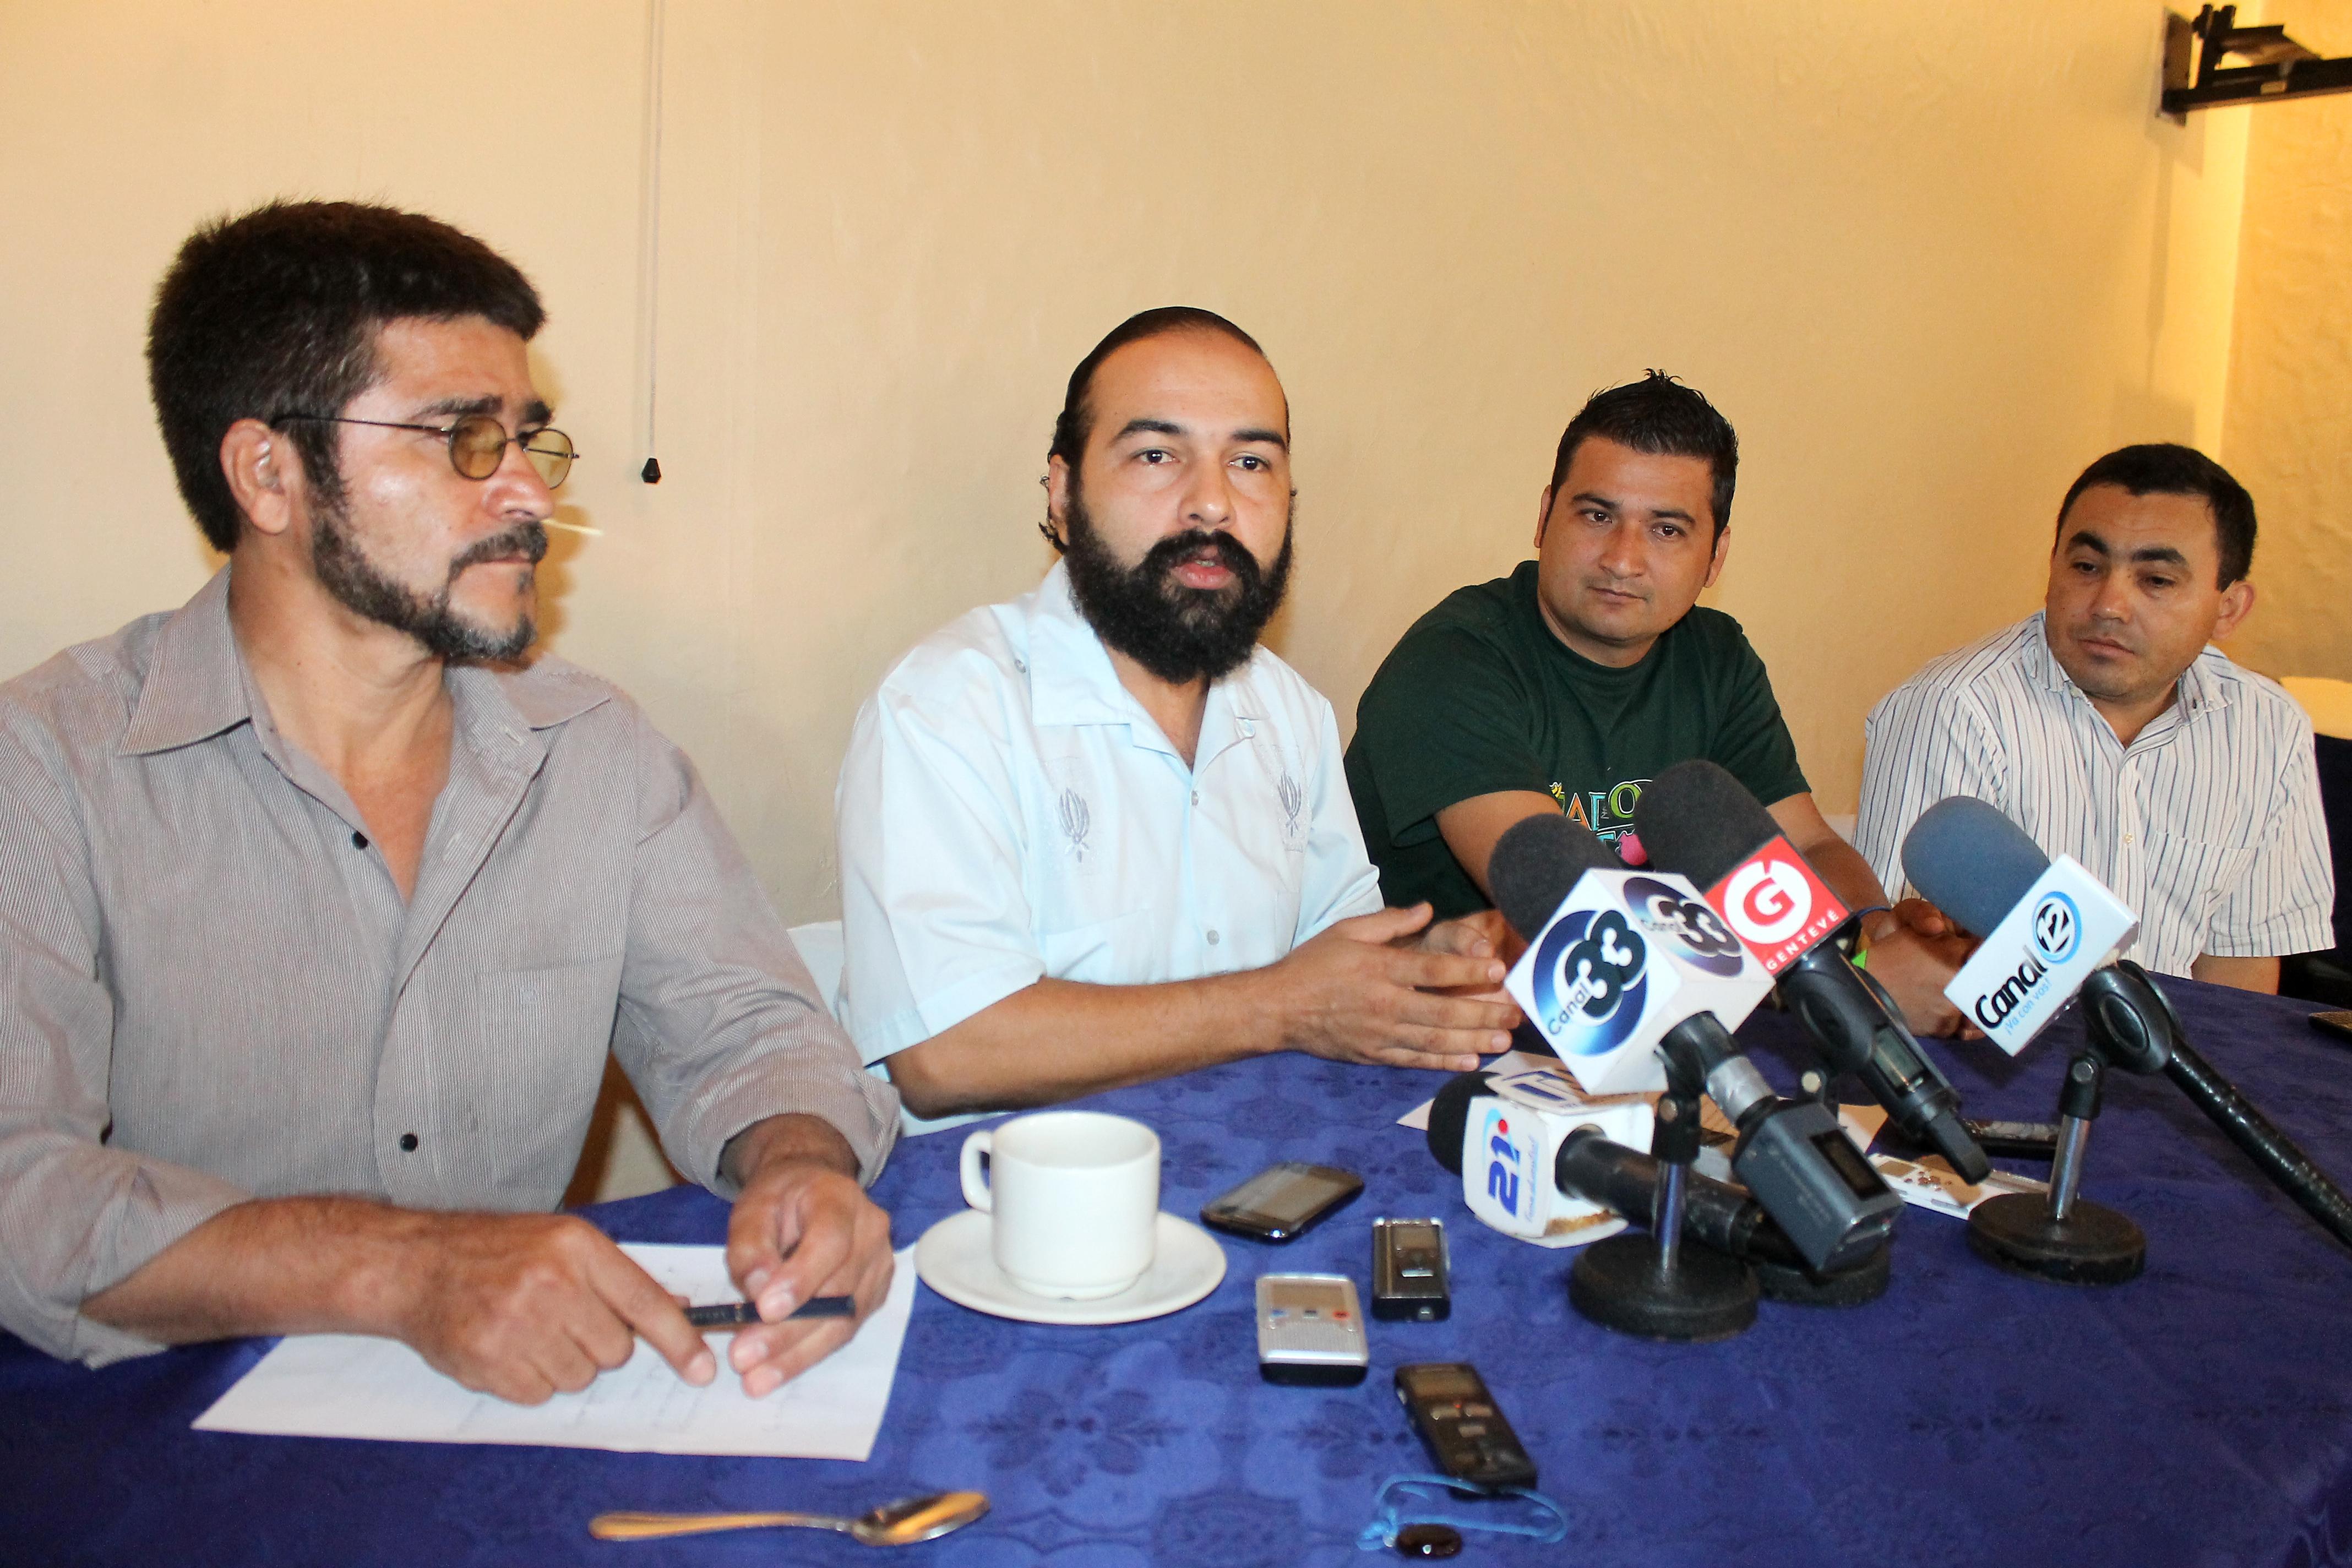 Antonio pacheco ades luis l pez abogado mesa nacional for Carles mesa radio nacional